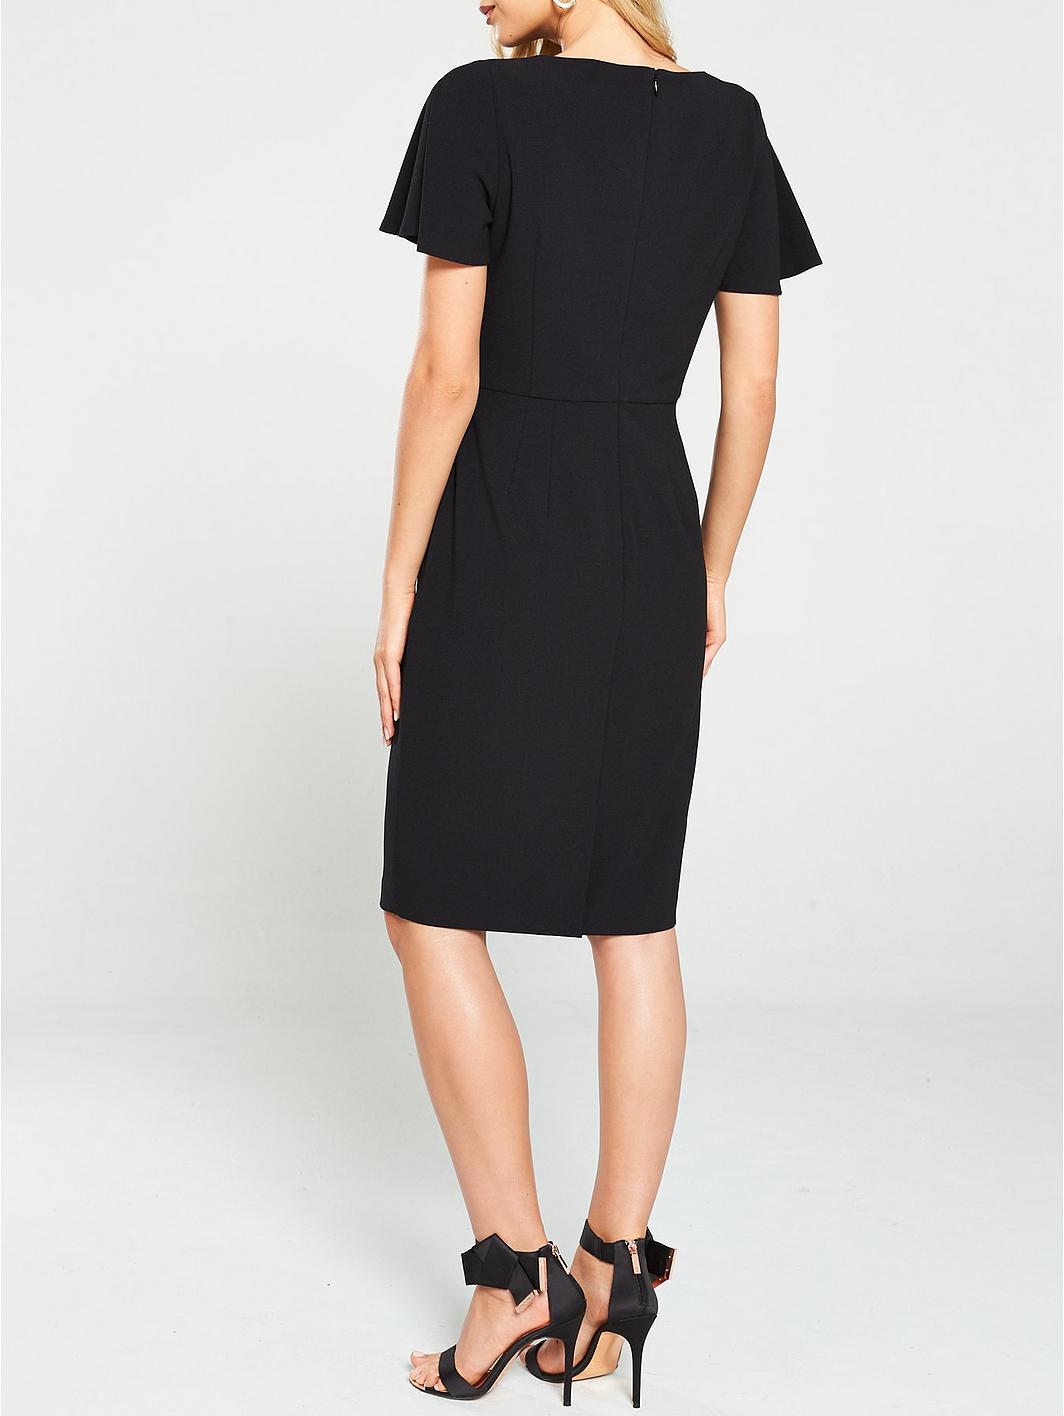 V by Very ButtonDetailPencil Dress - Black zcs6Fd